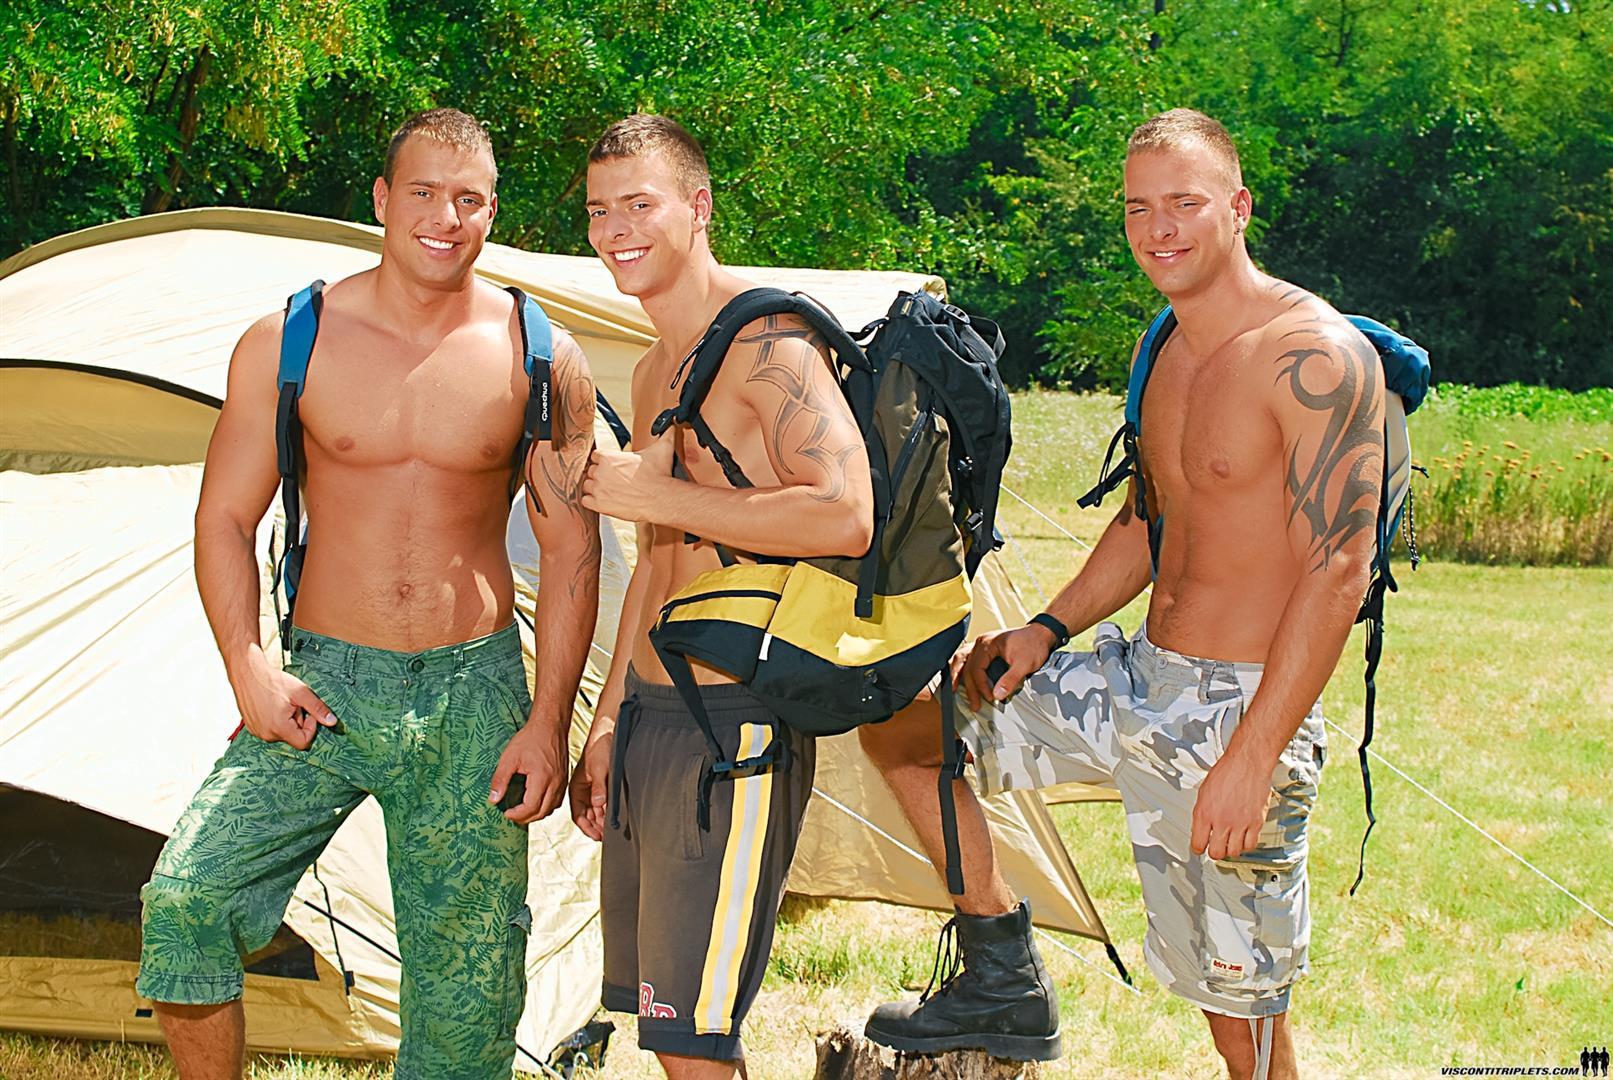 Visconti-Triplets-Jason-Visconti-Jimmy-Visconti-Joey-Visconti-Giuseppe-Pardi-Fucking-During-A-Camping-Trip-Amateur-Gay-Porn-01.jpg